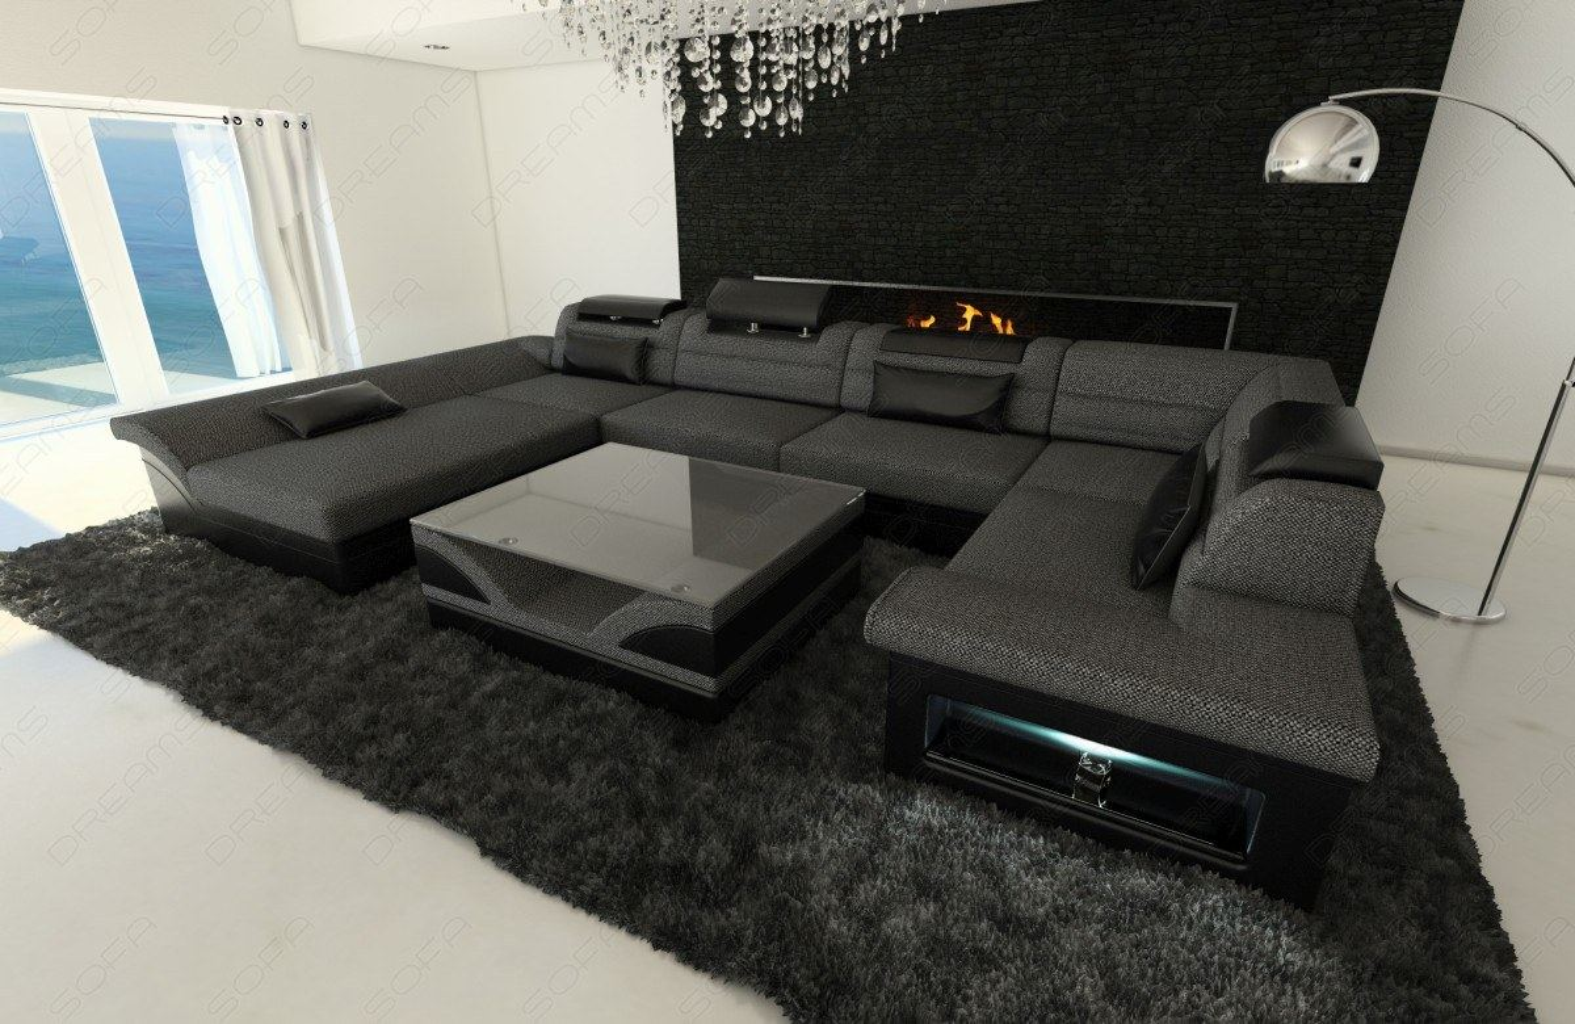 Interior Design New Look Fabric Enzo U Shaped Fabric Sofa With Led In Dark Grey Ebay